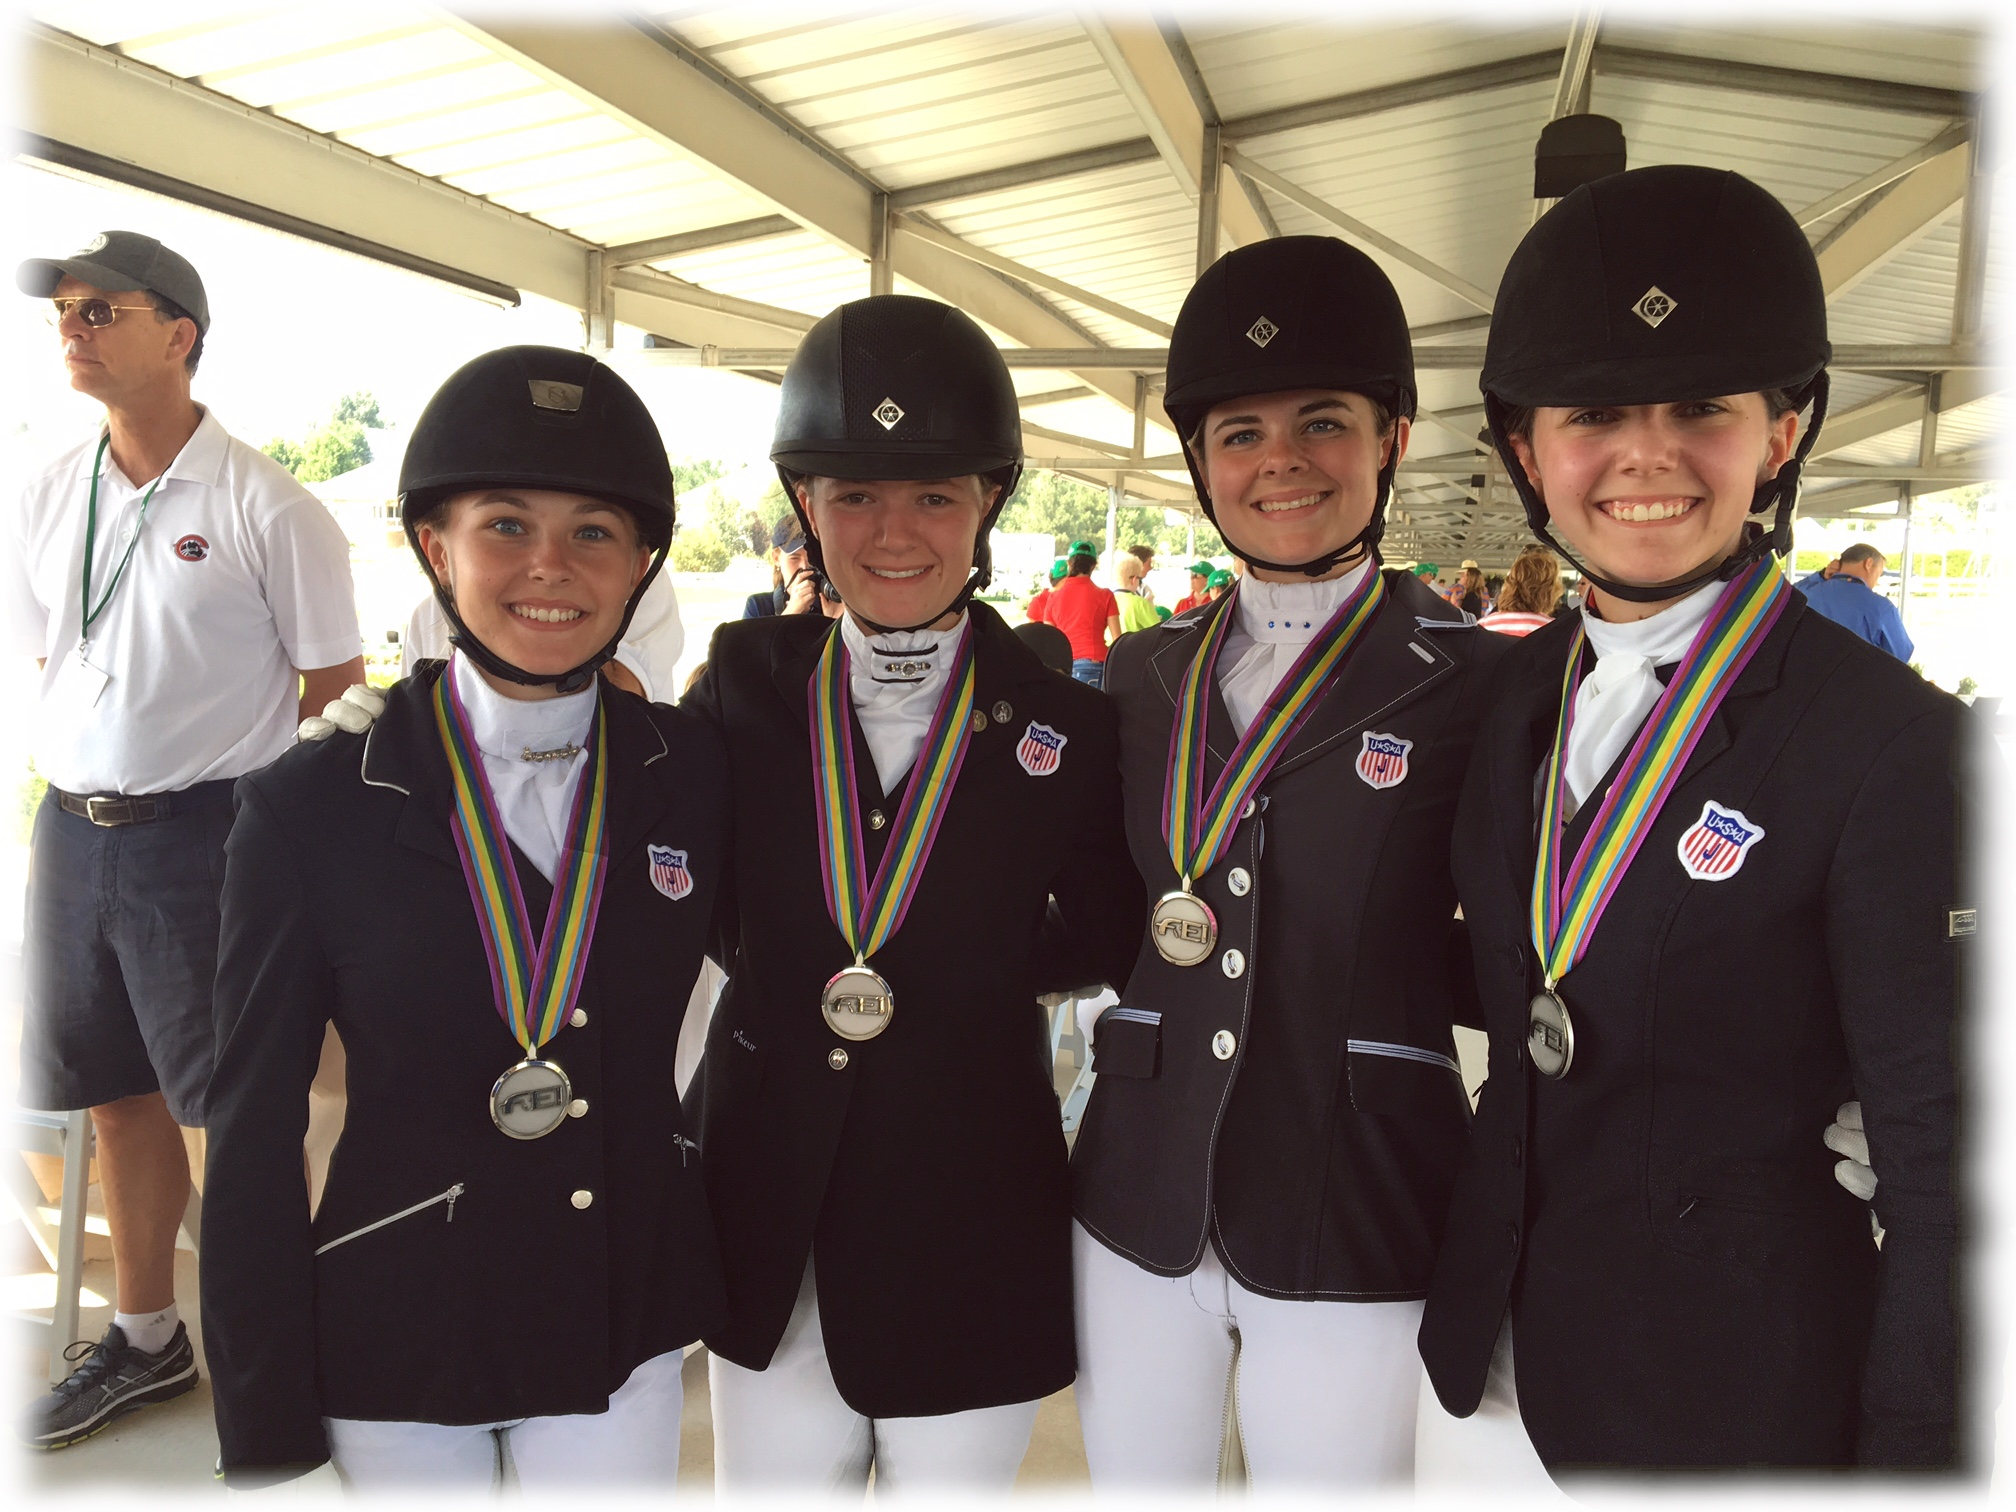 Silver Winning Team